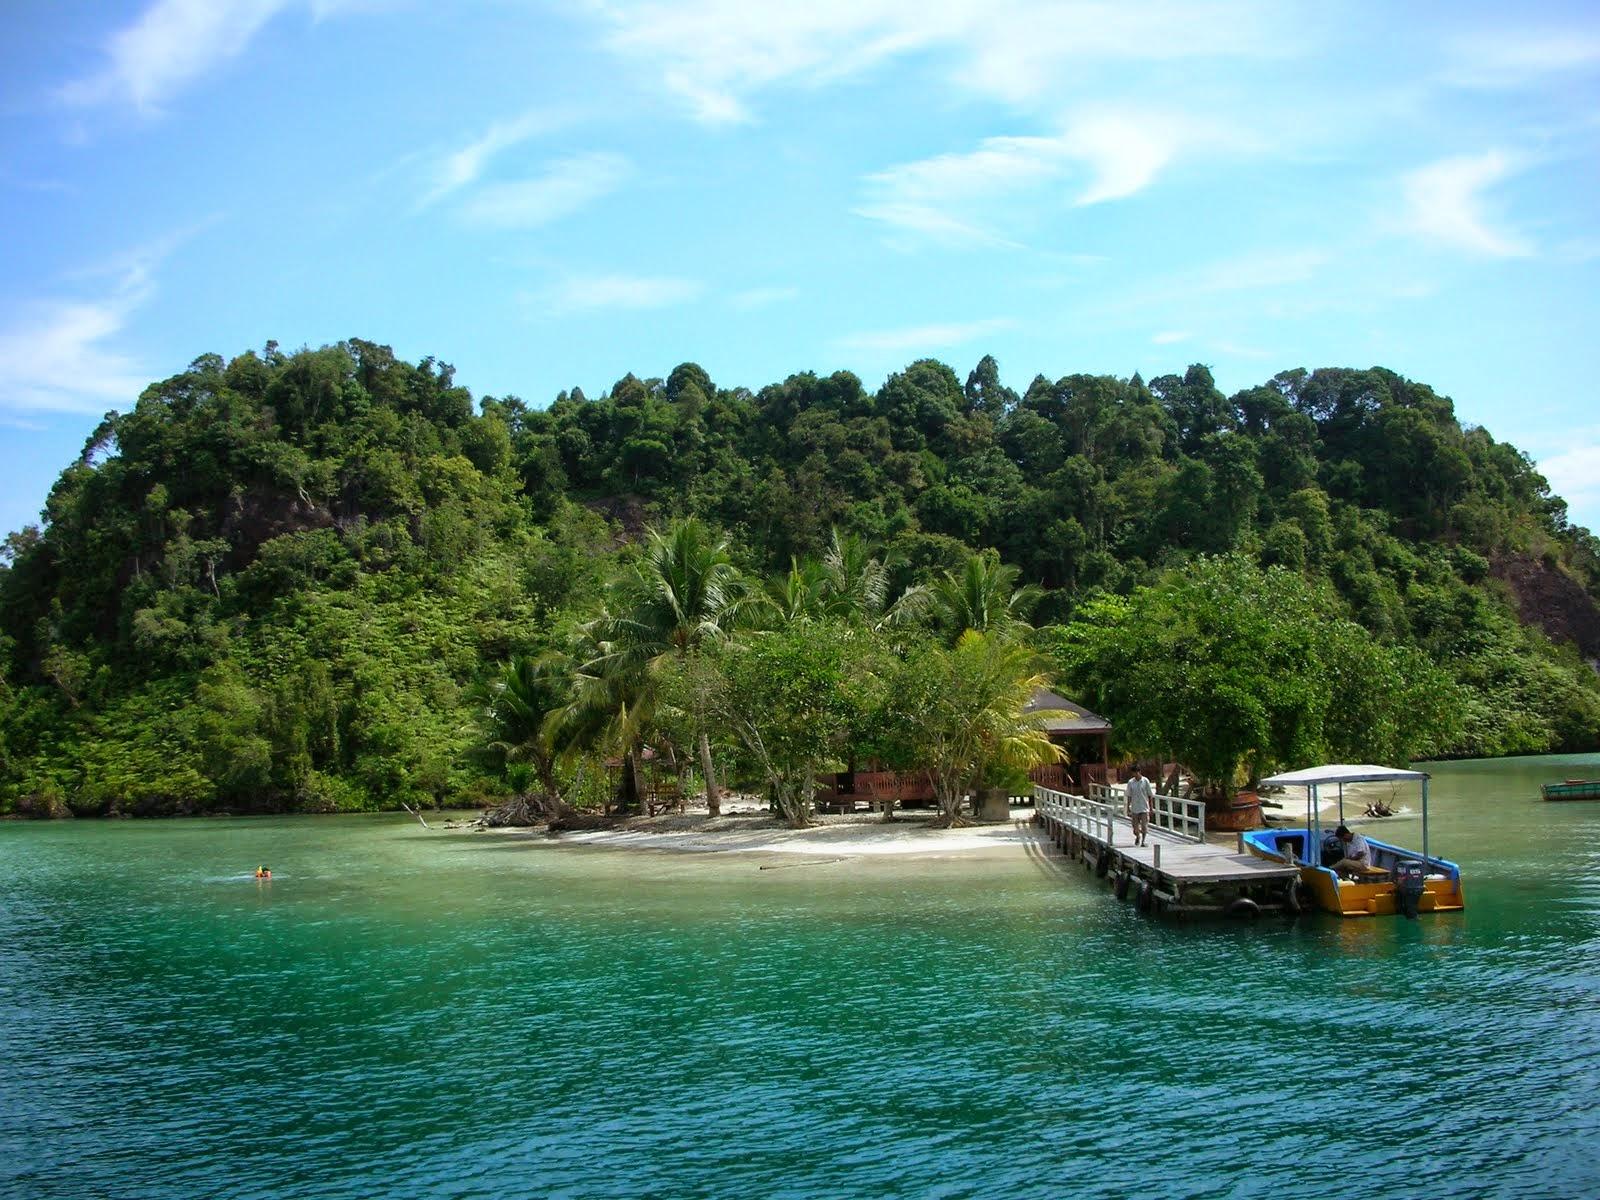 Poncan Island